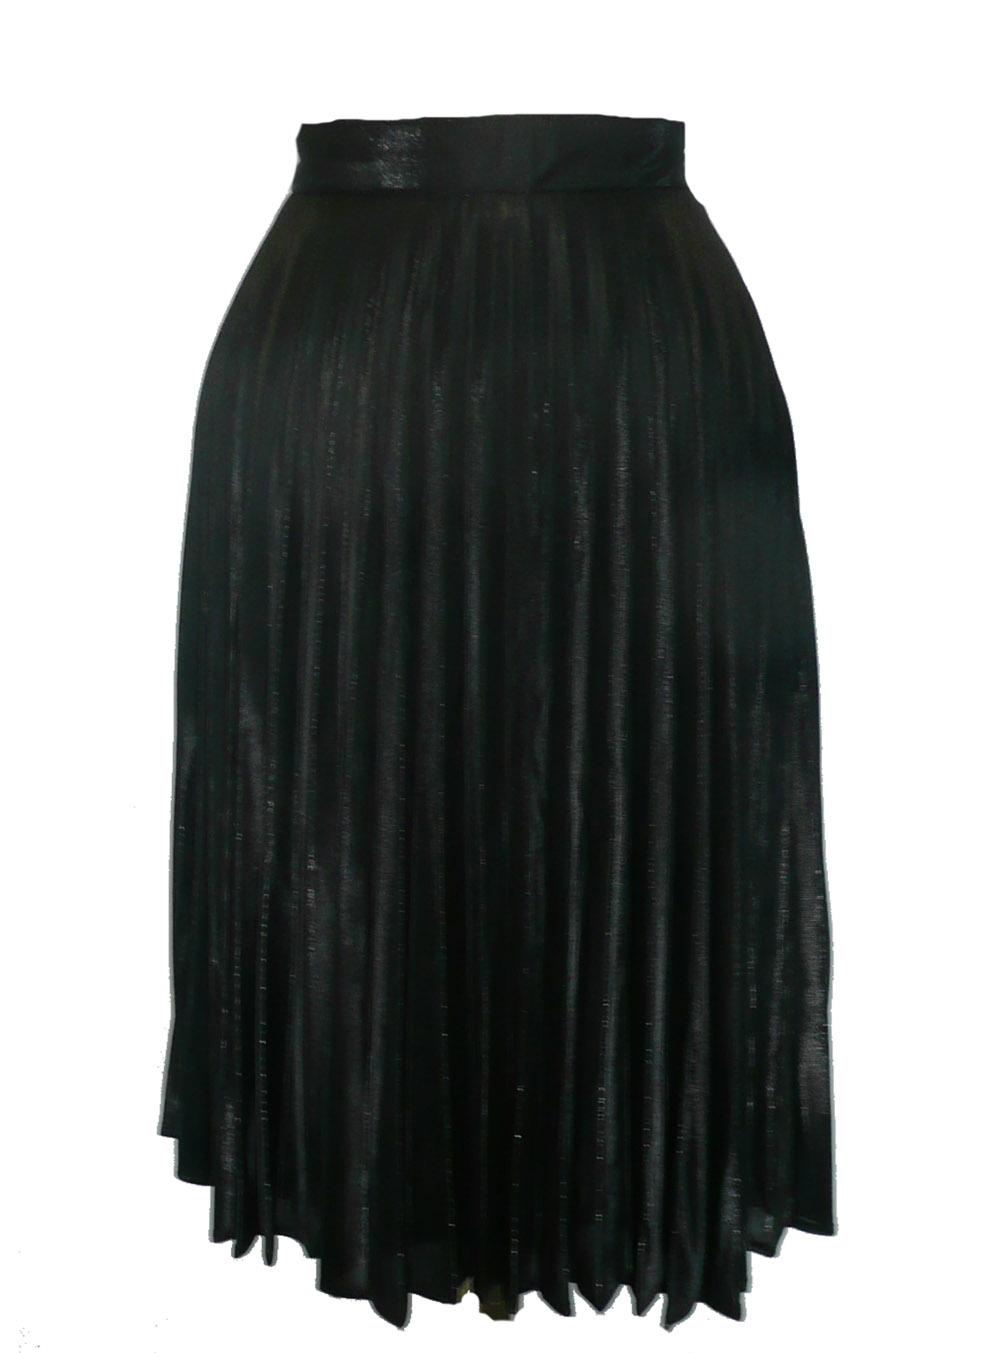 skirt long blk pleats.jpg